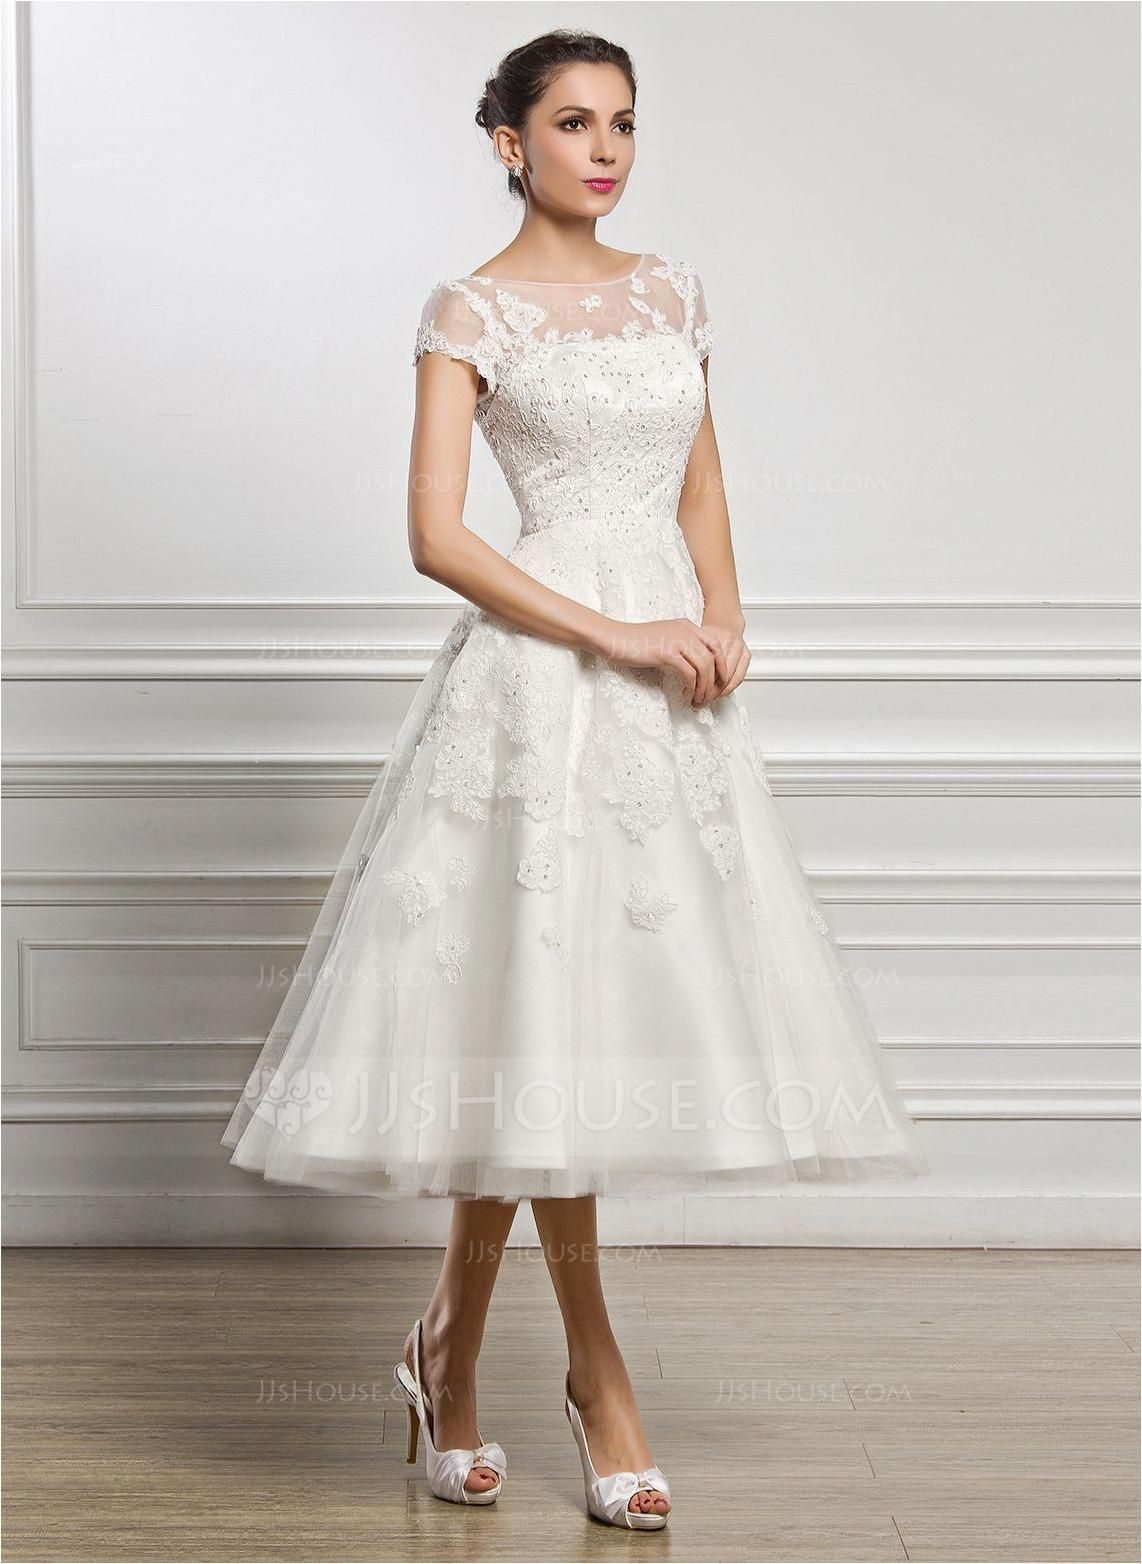 Strapless Wedding Dresses Best Priced Wedding Dresses Wedding